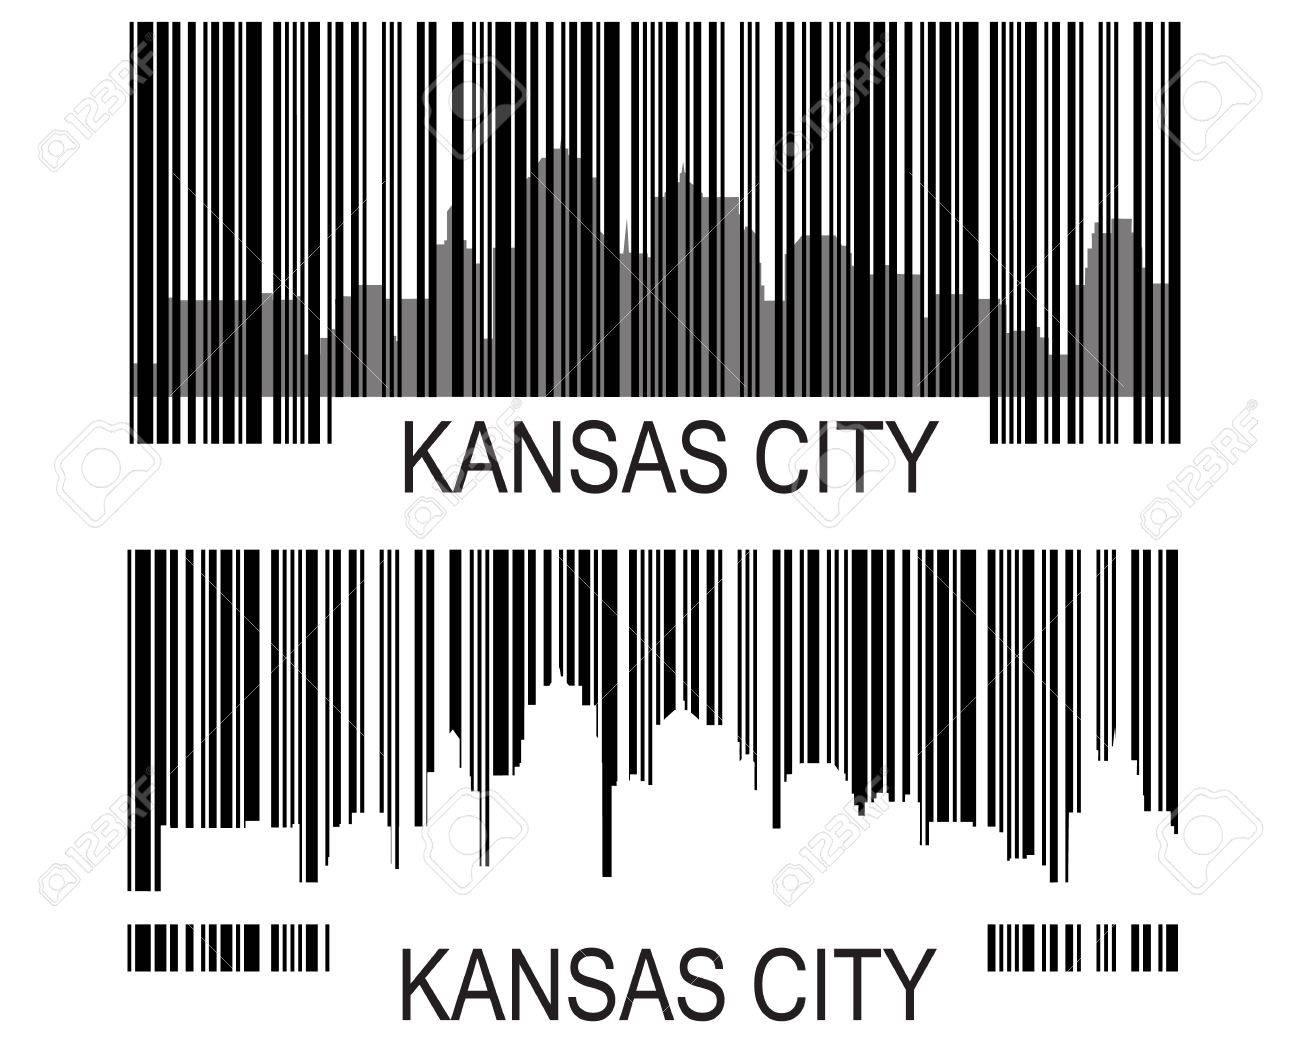 City of Kansas City high rise building  skyline Stock Vector - 11885302